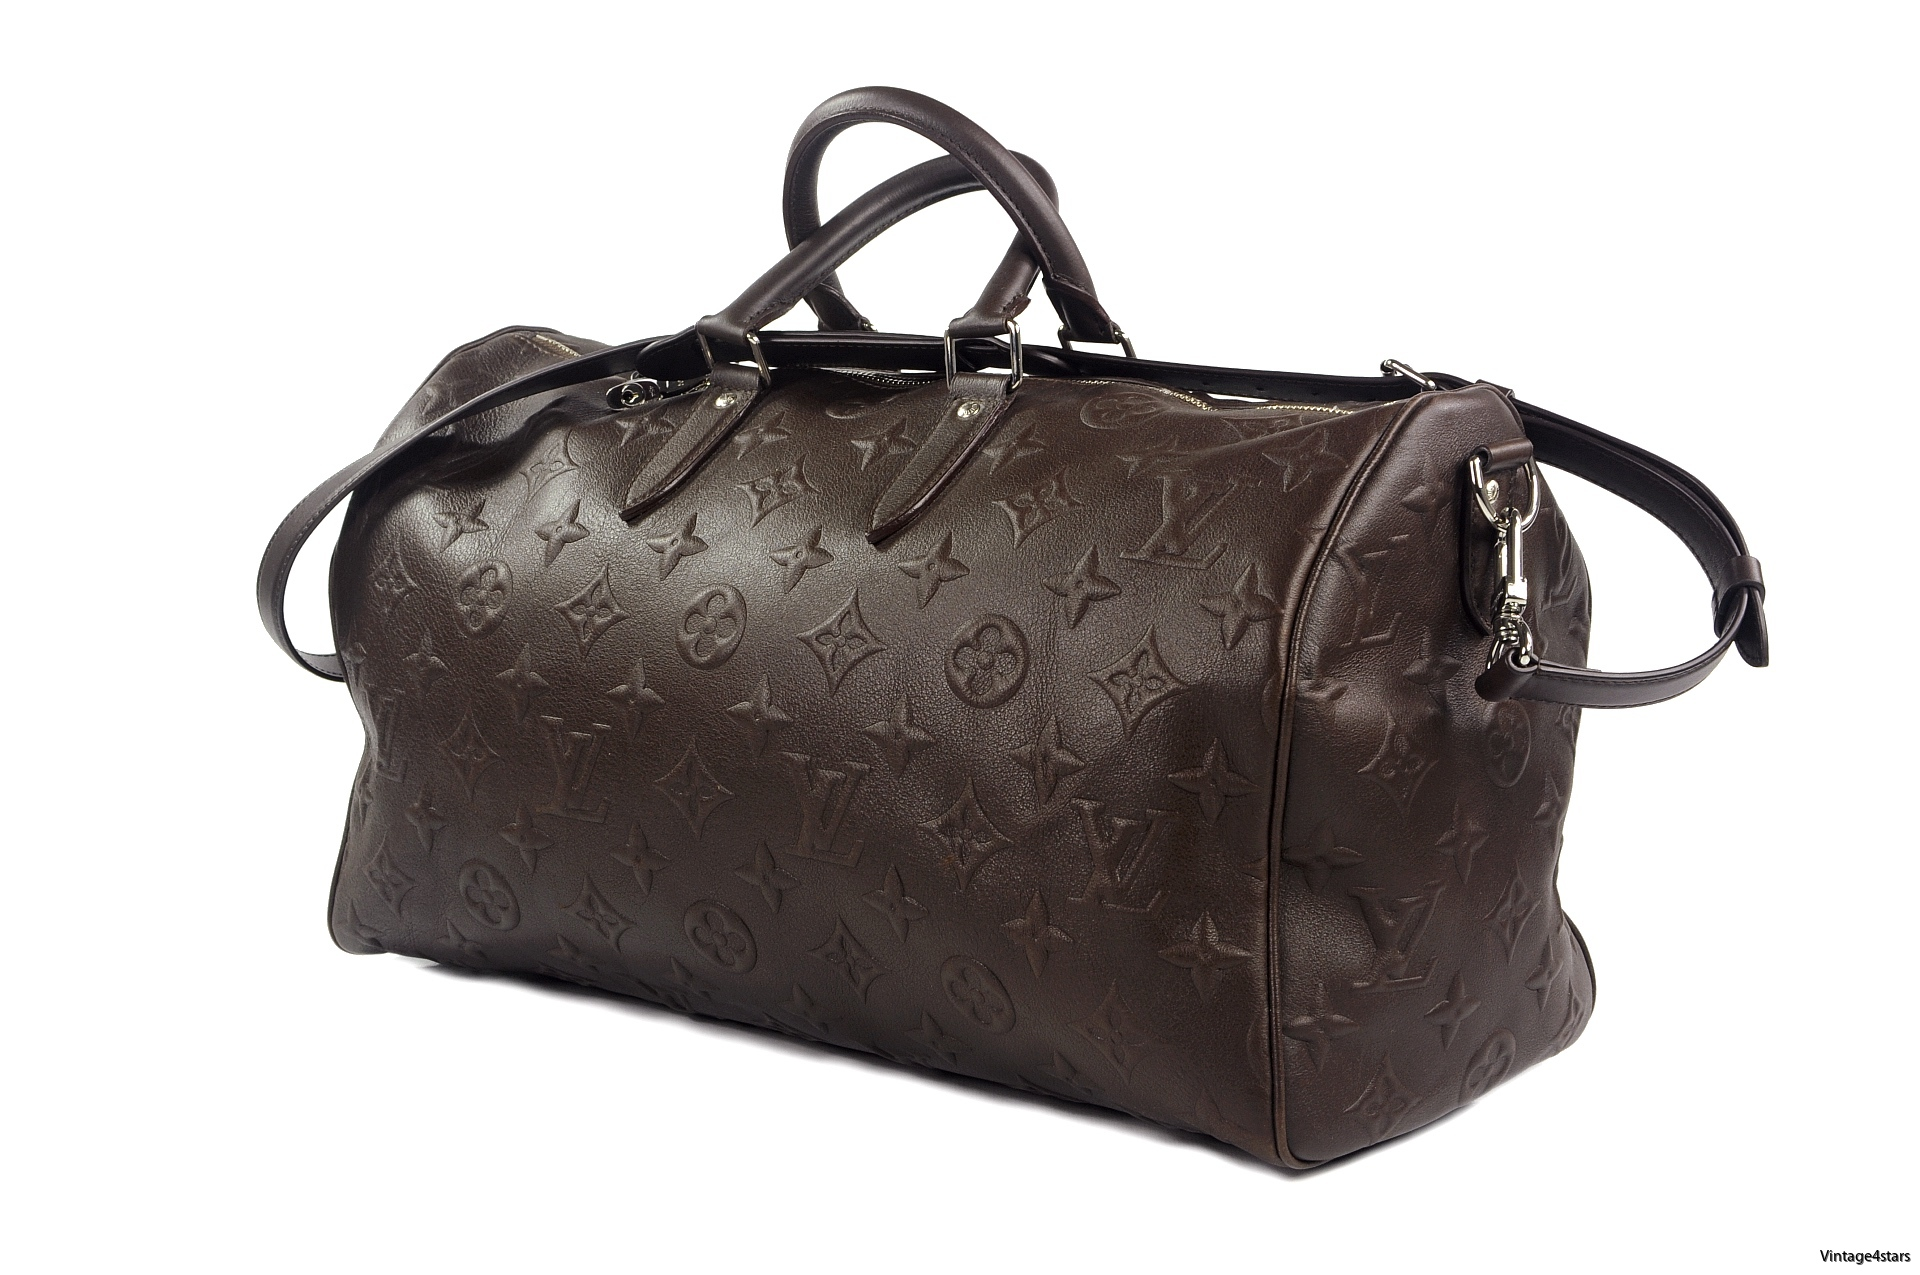 Louis Vuitton Keepall Edun 1-2